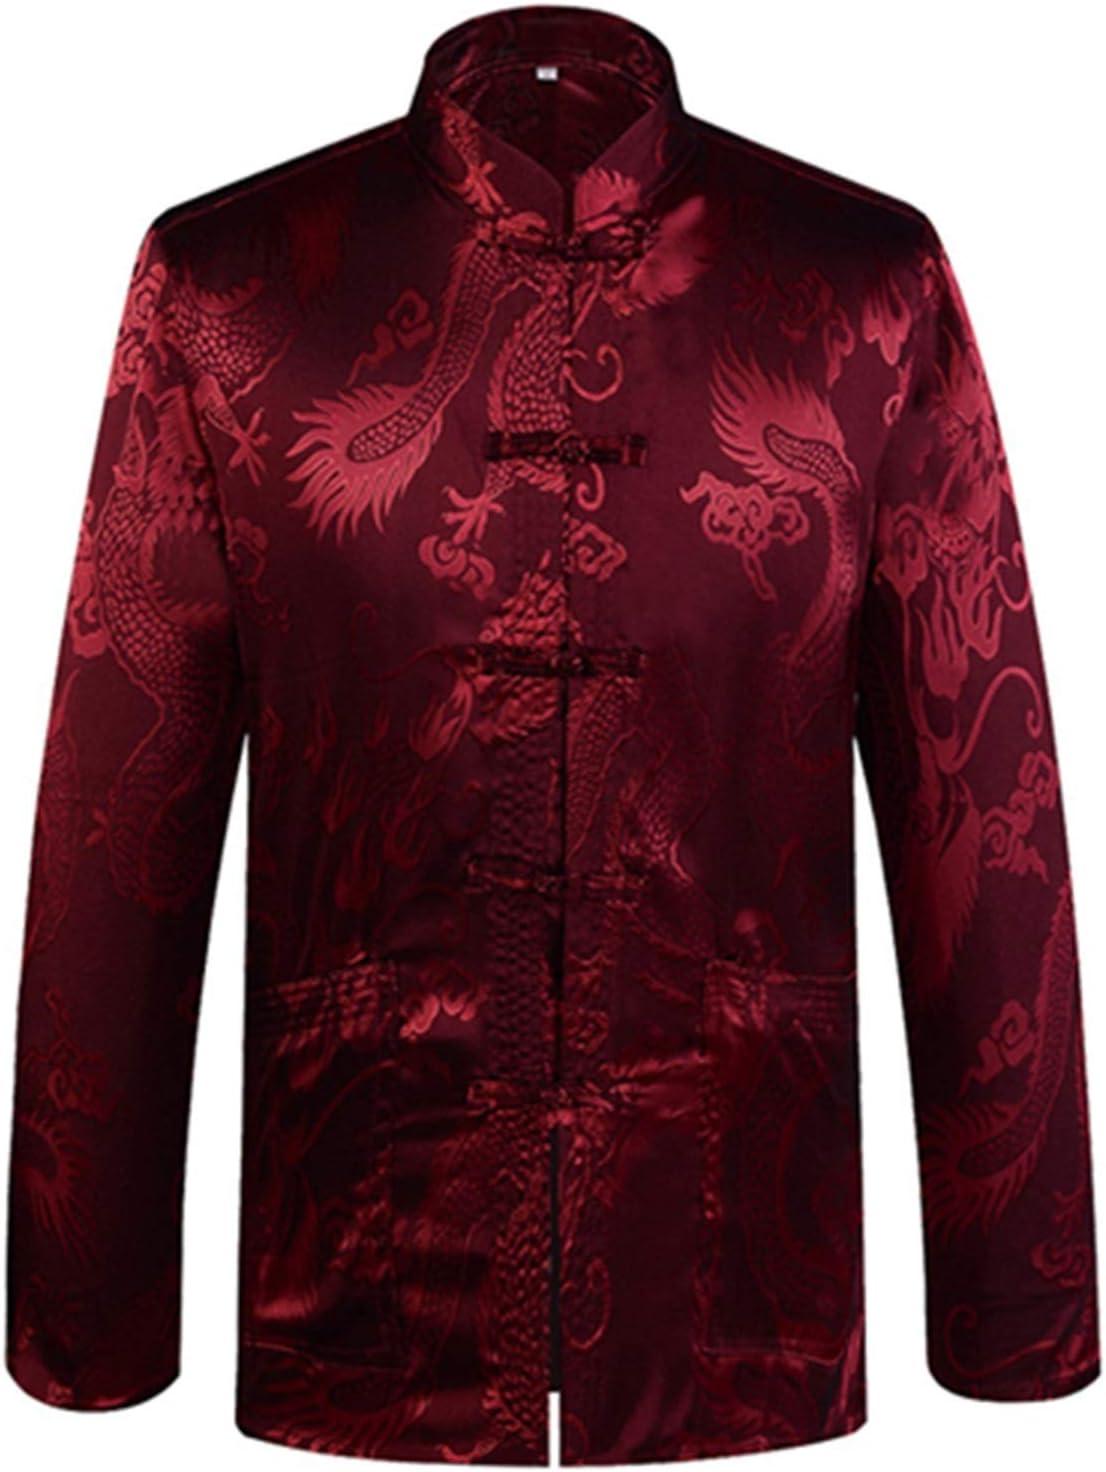 Designer Chinese Traditional Men's Satin Mandarin Collar Dragon Silk Tang Suit Clothing Kung Fu Jacket Coat (Color : A Burgundy, Size : L 170)